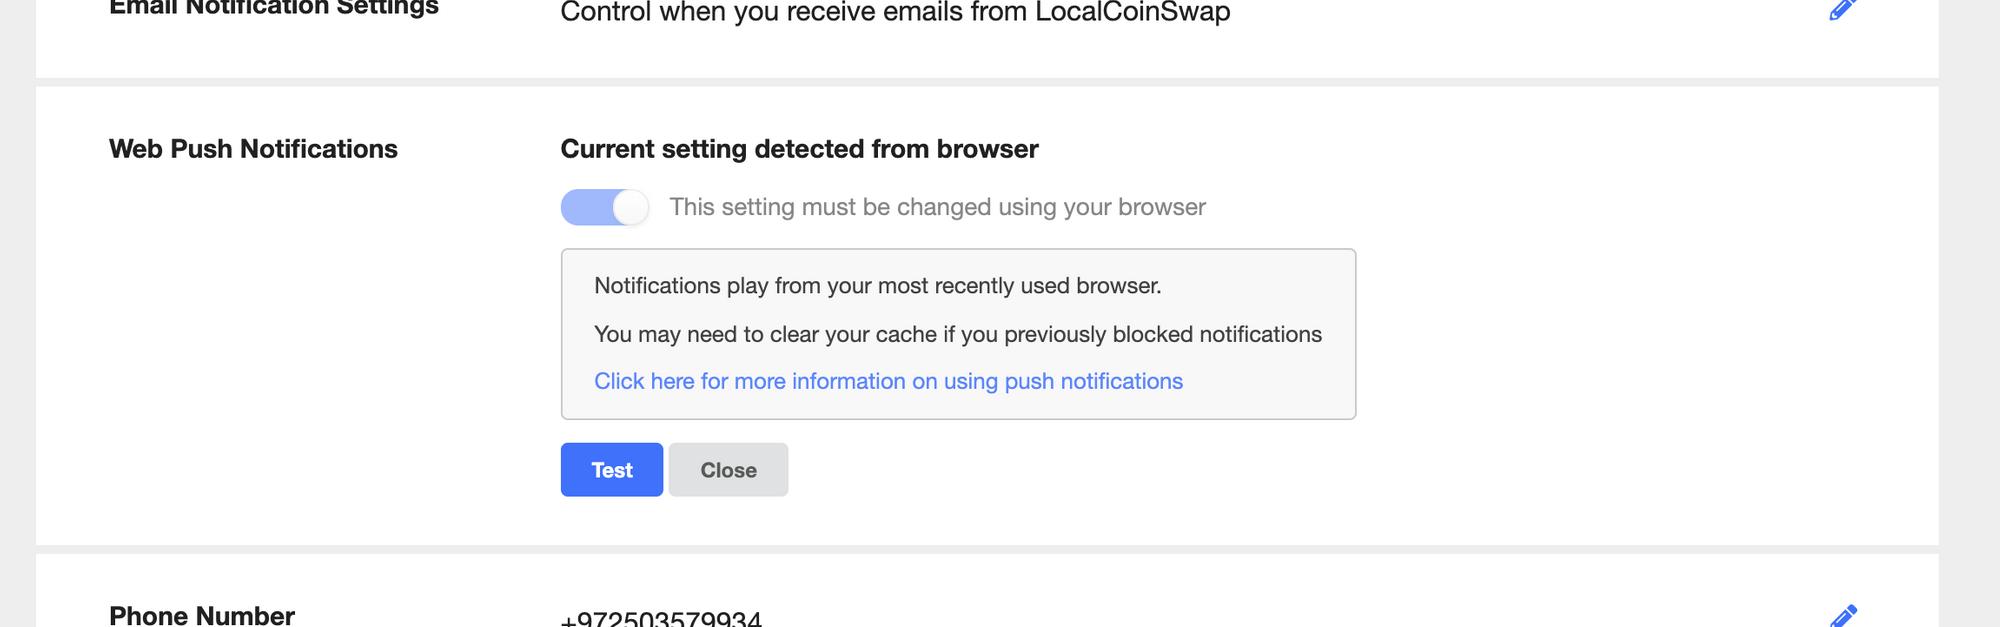 enabling push notifications on LocalCoinSwap